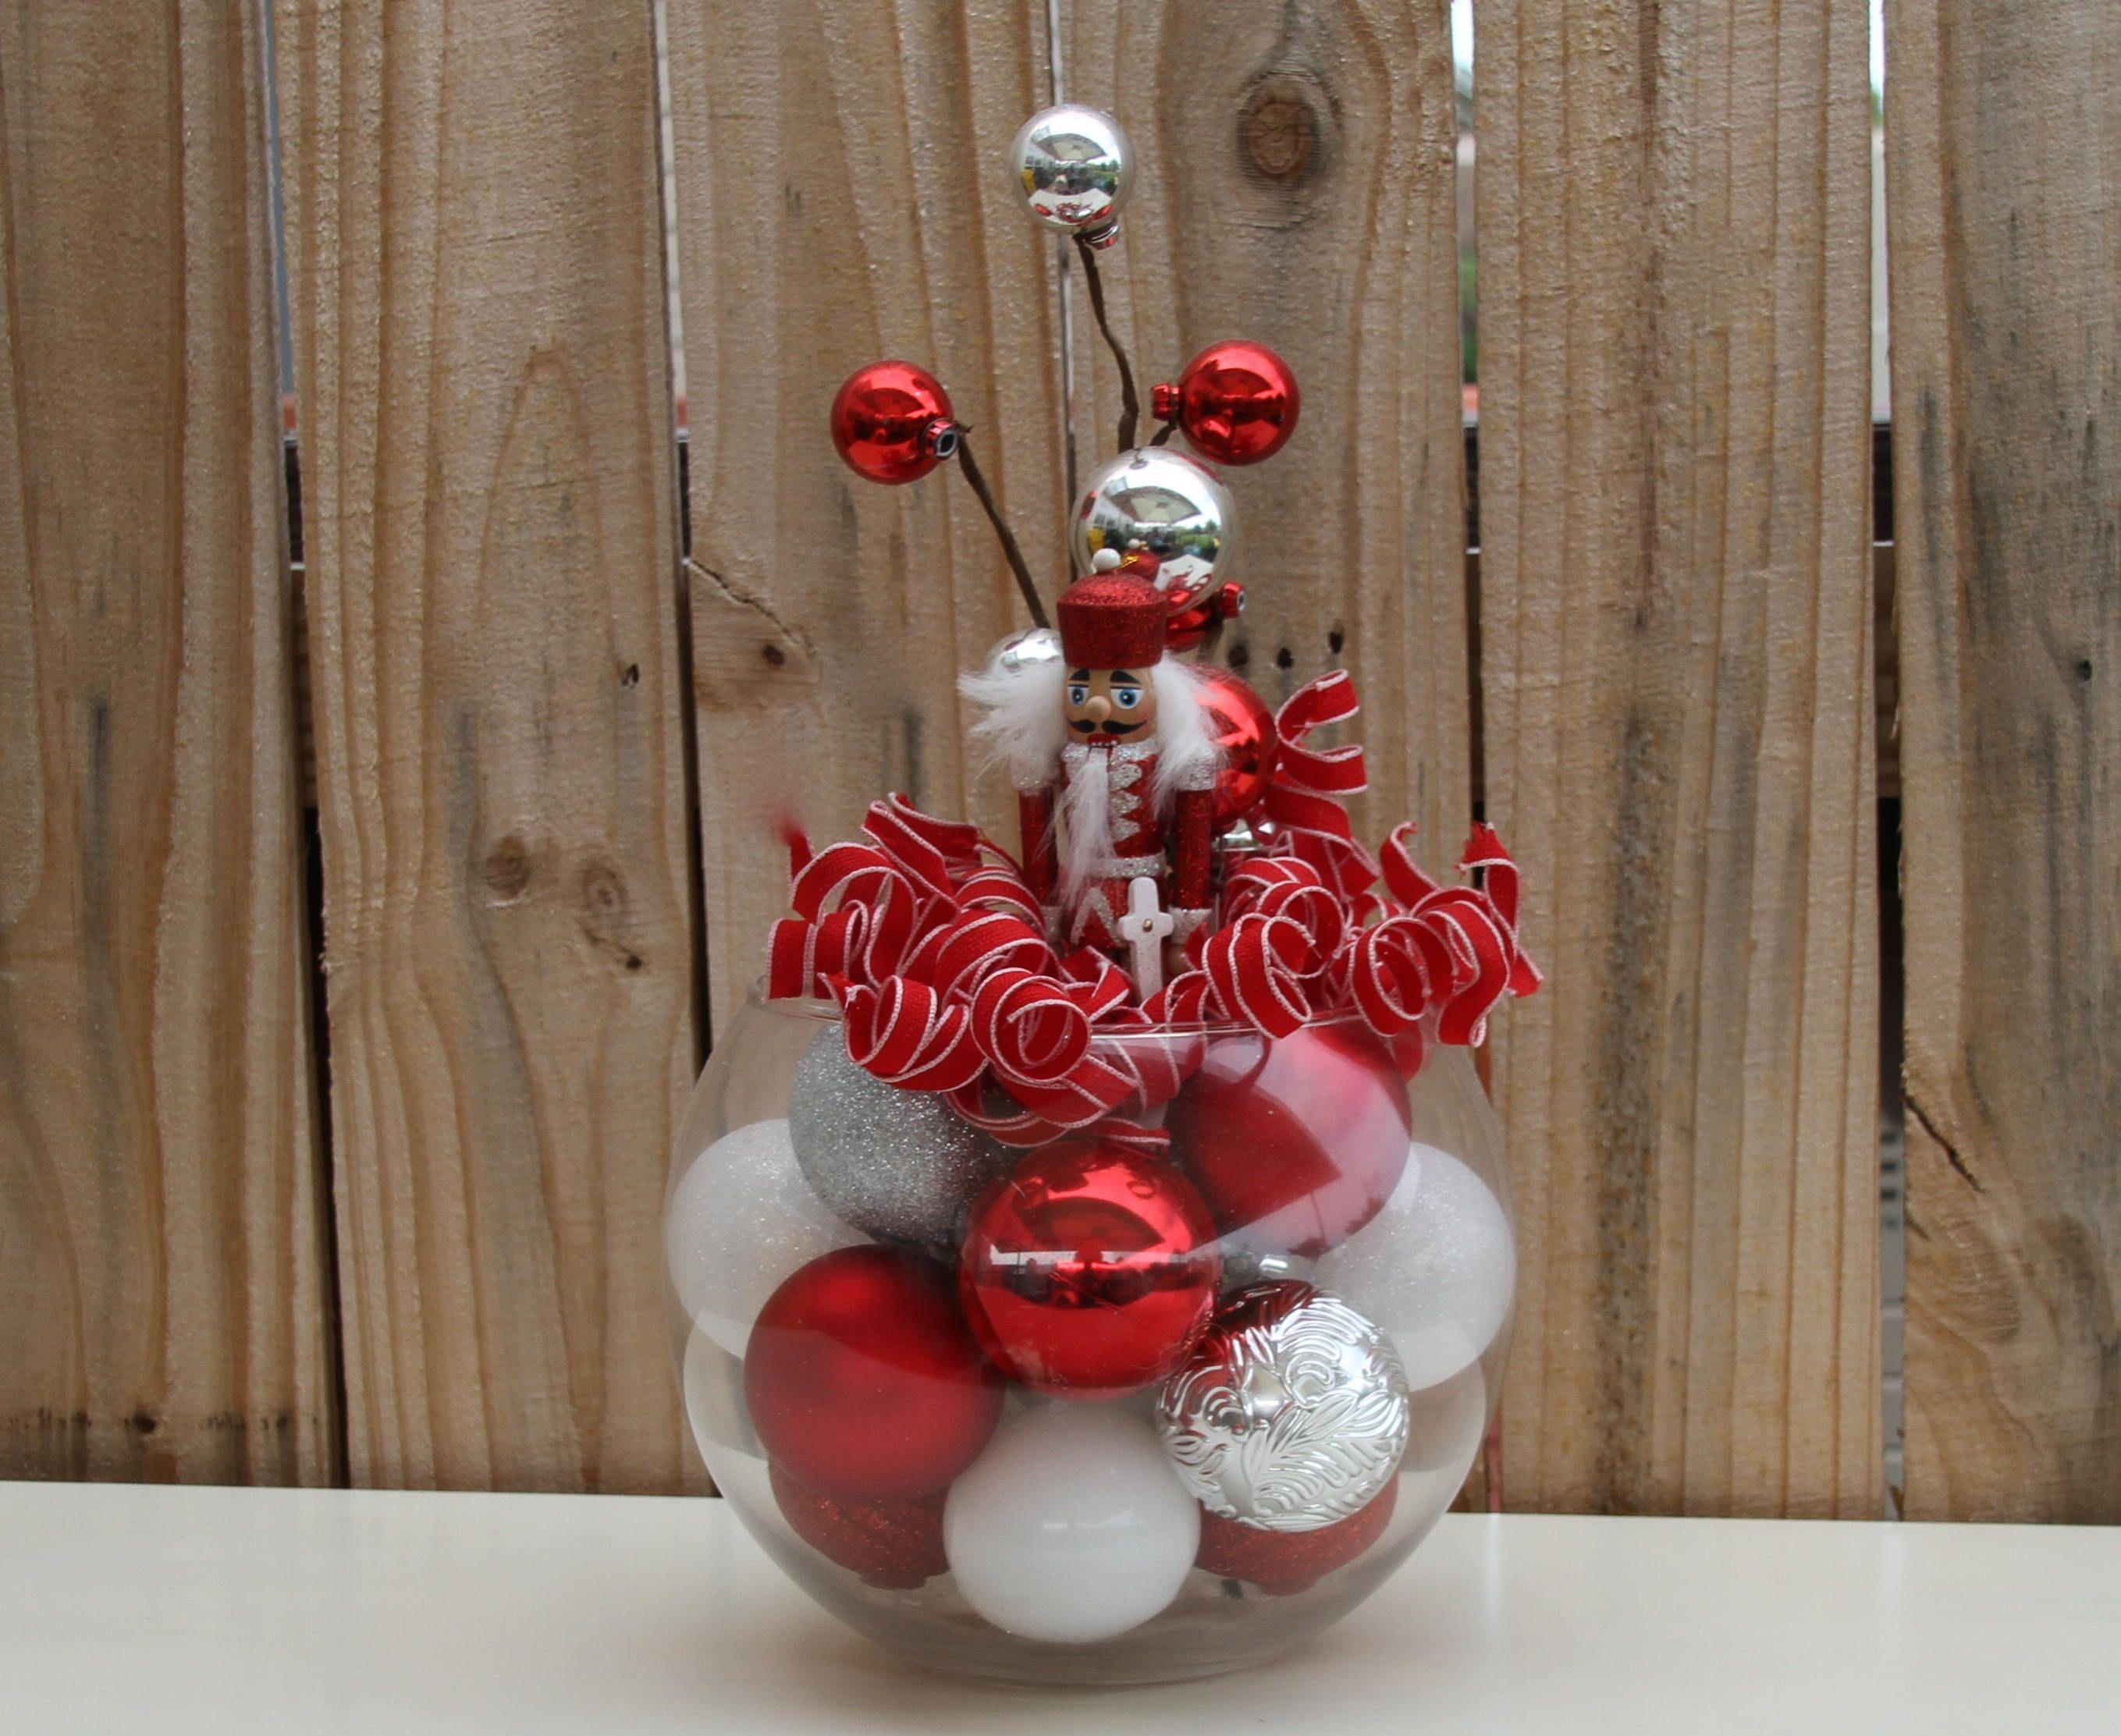 Nutcracker Christmas Centerpiece Red and Silver Holiday Home Decor